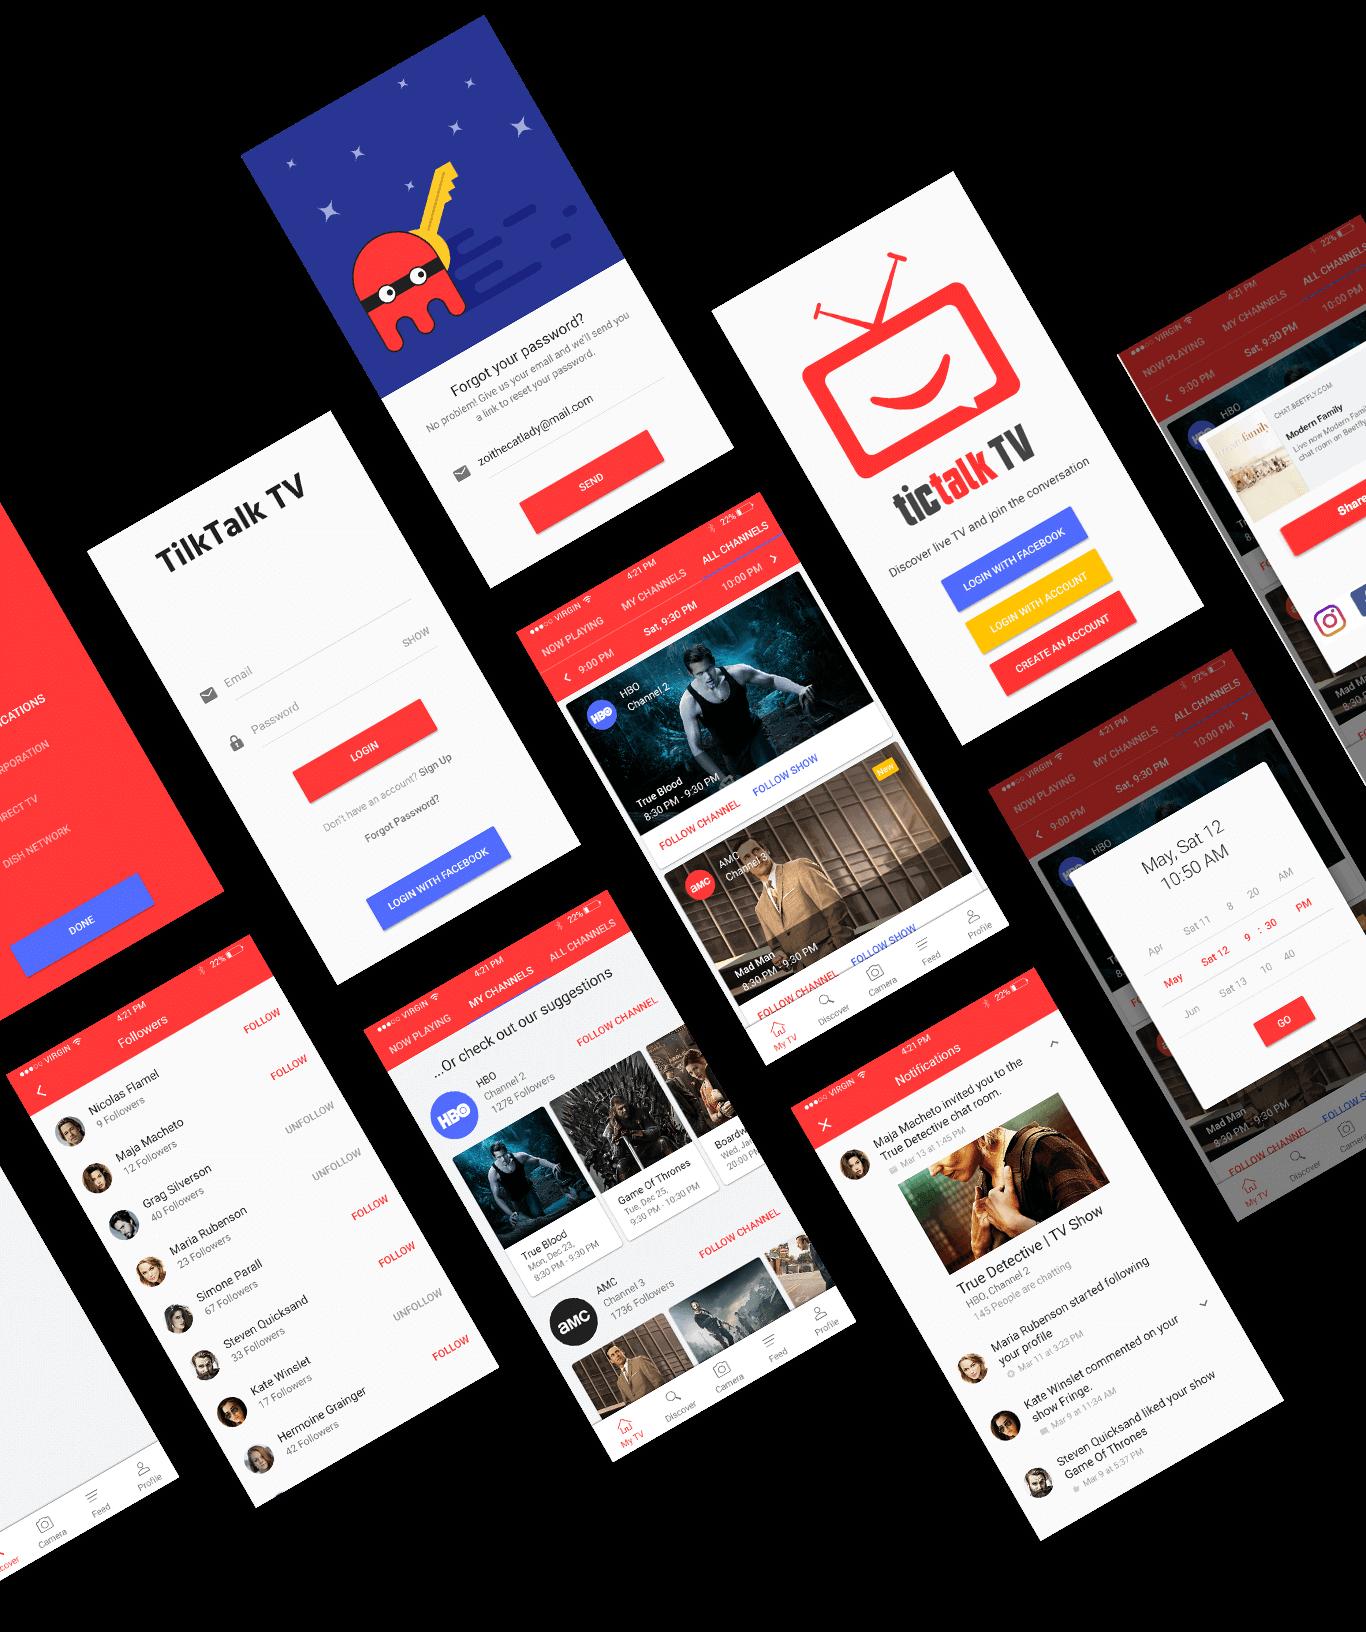 Tictalk TV app final design